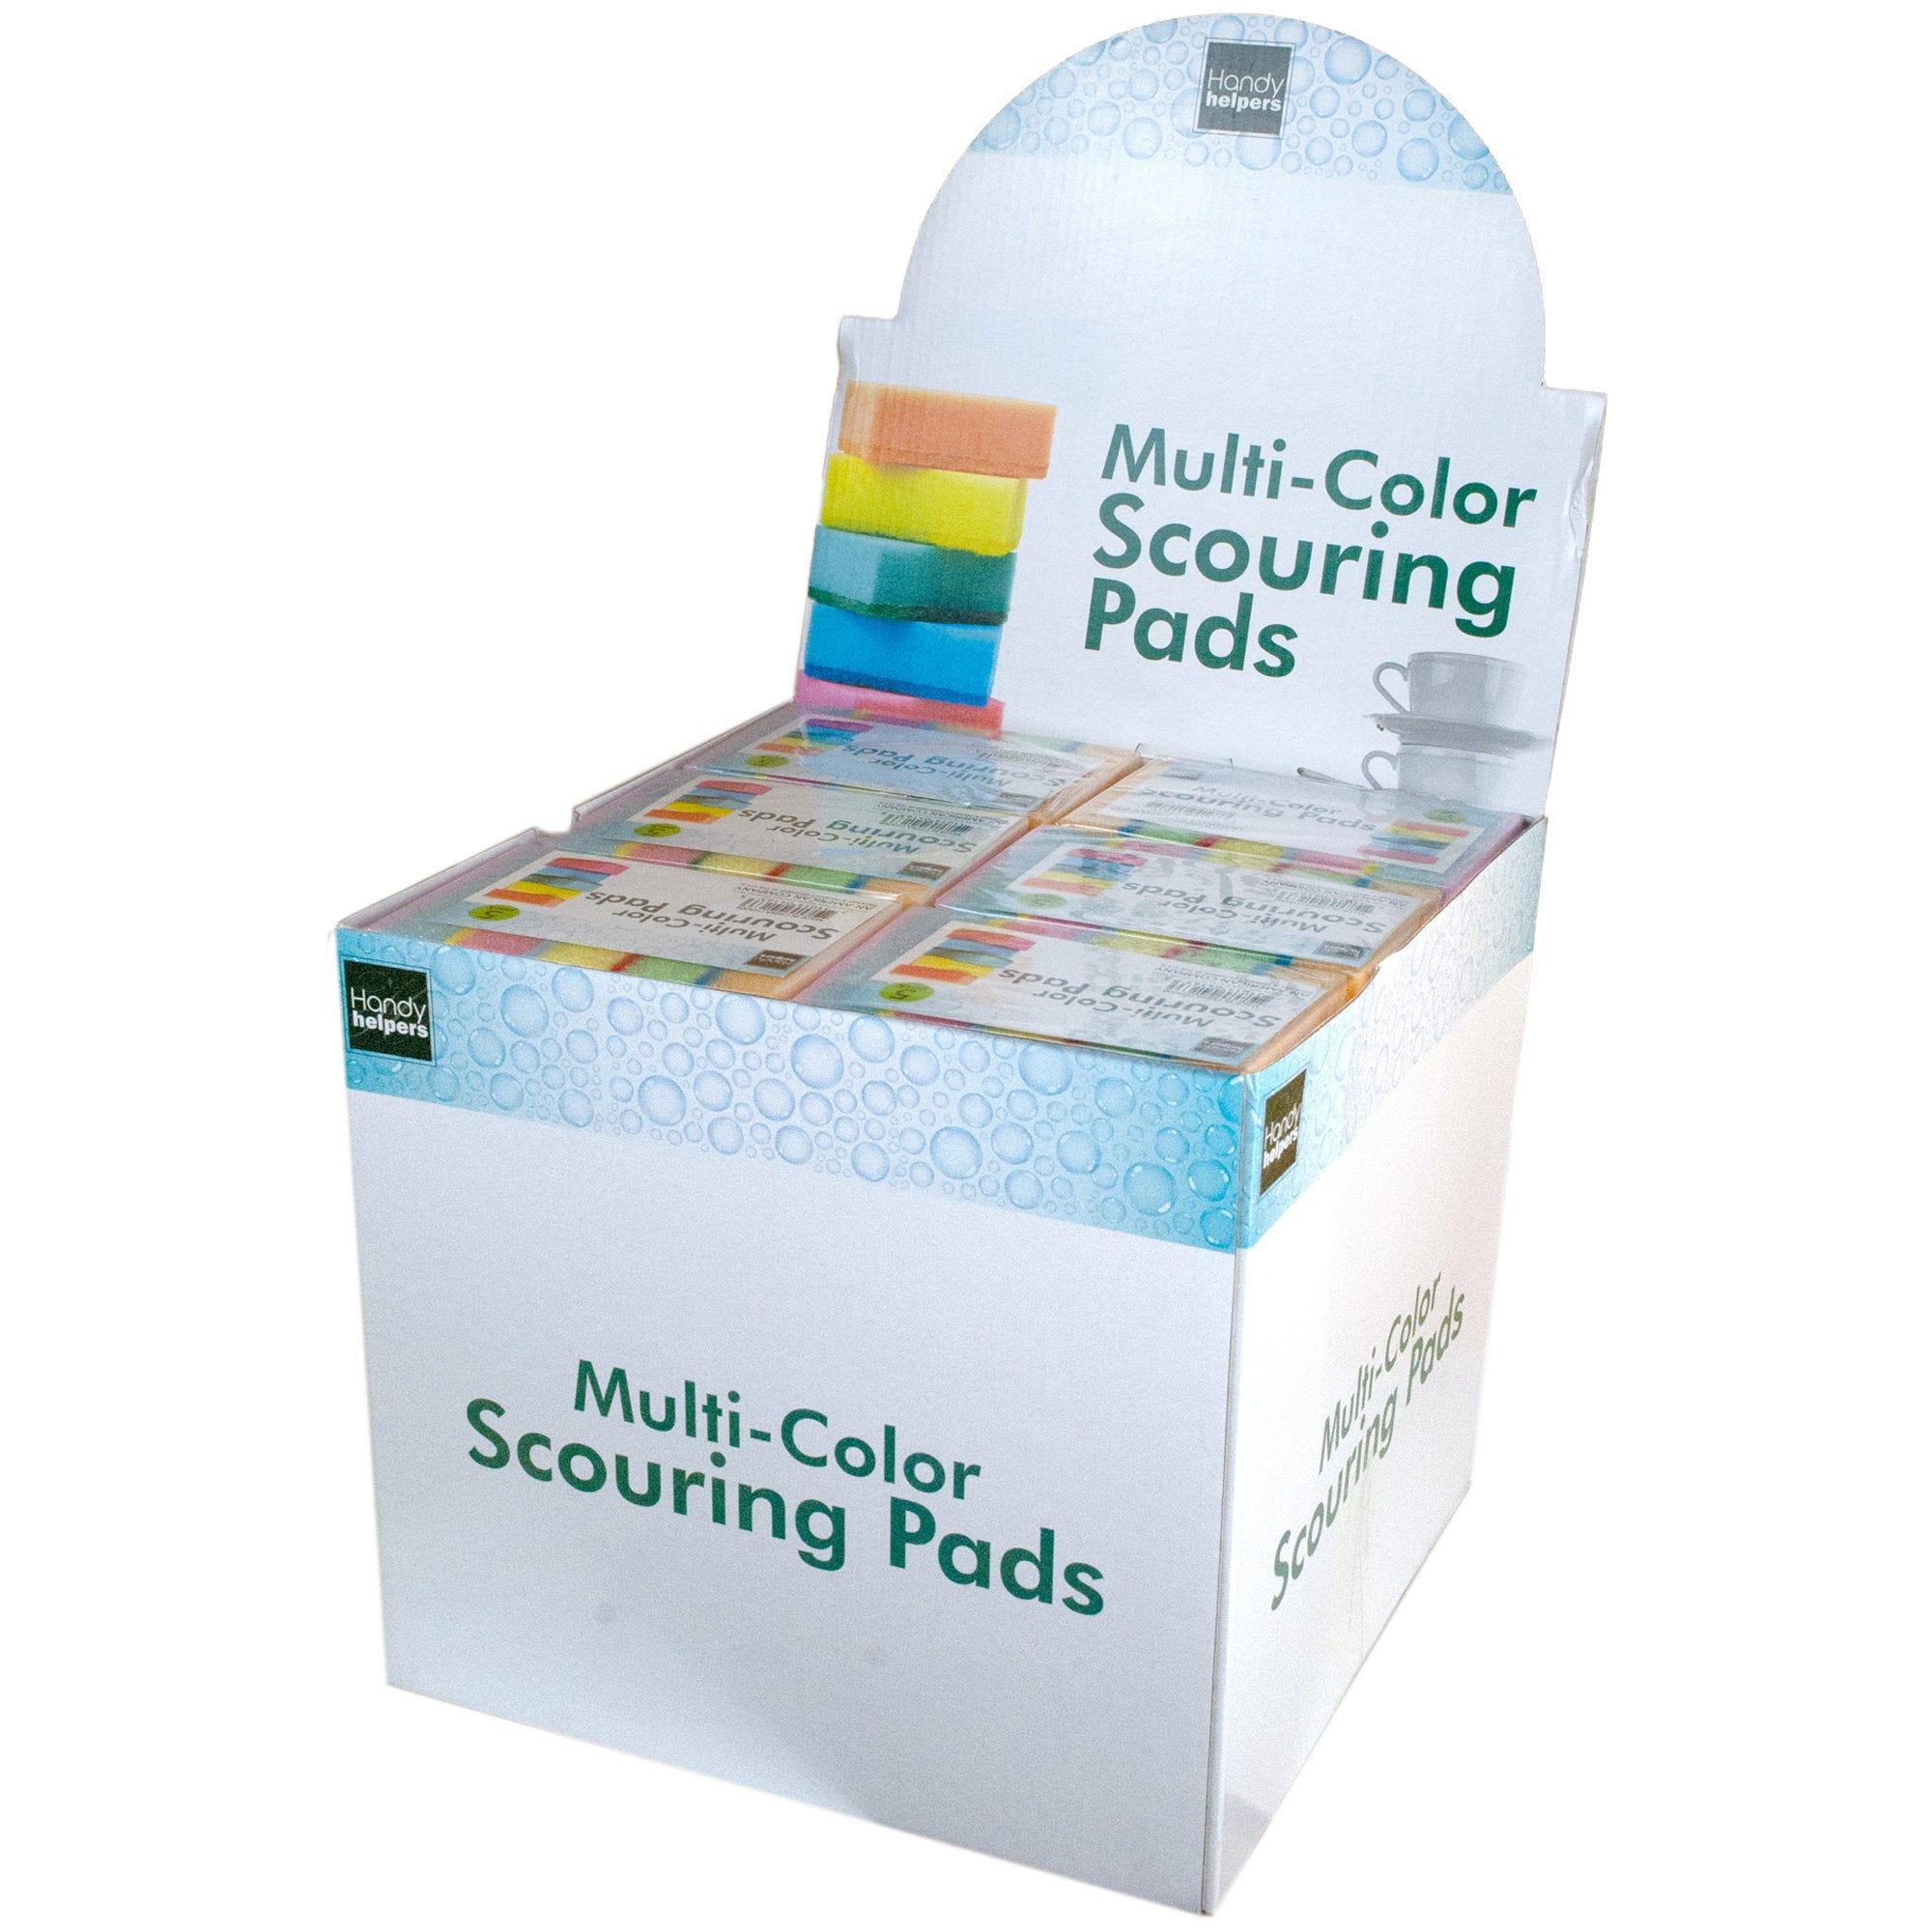 Scouring Sponge Pad Set Countertop Display